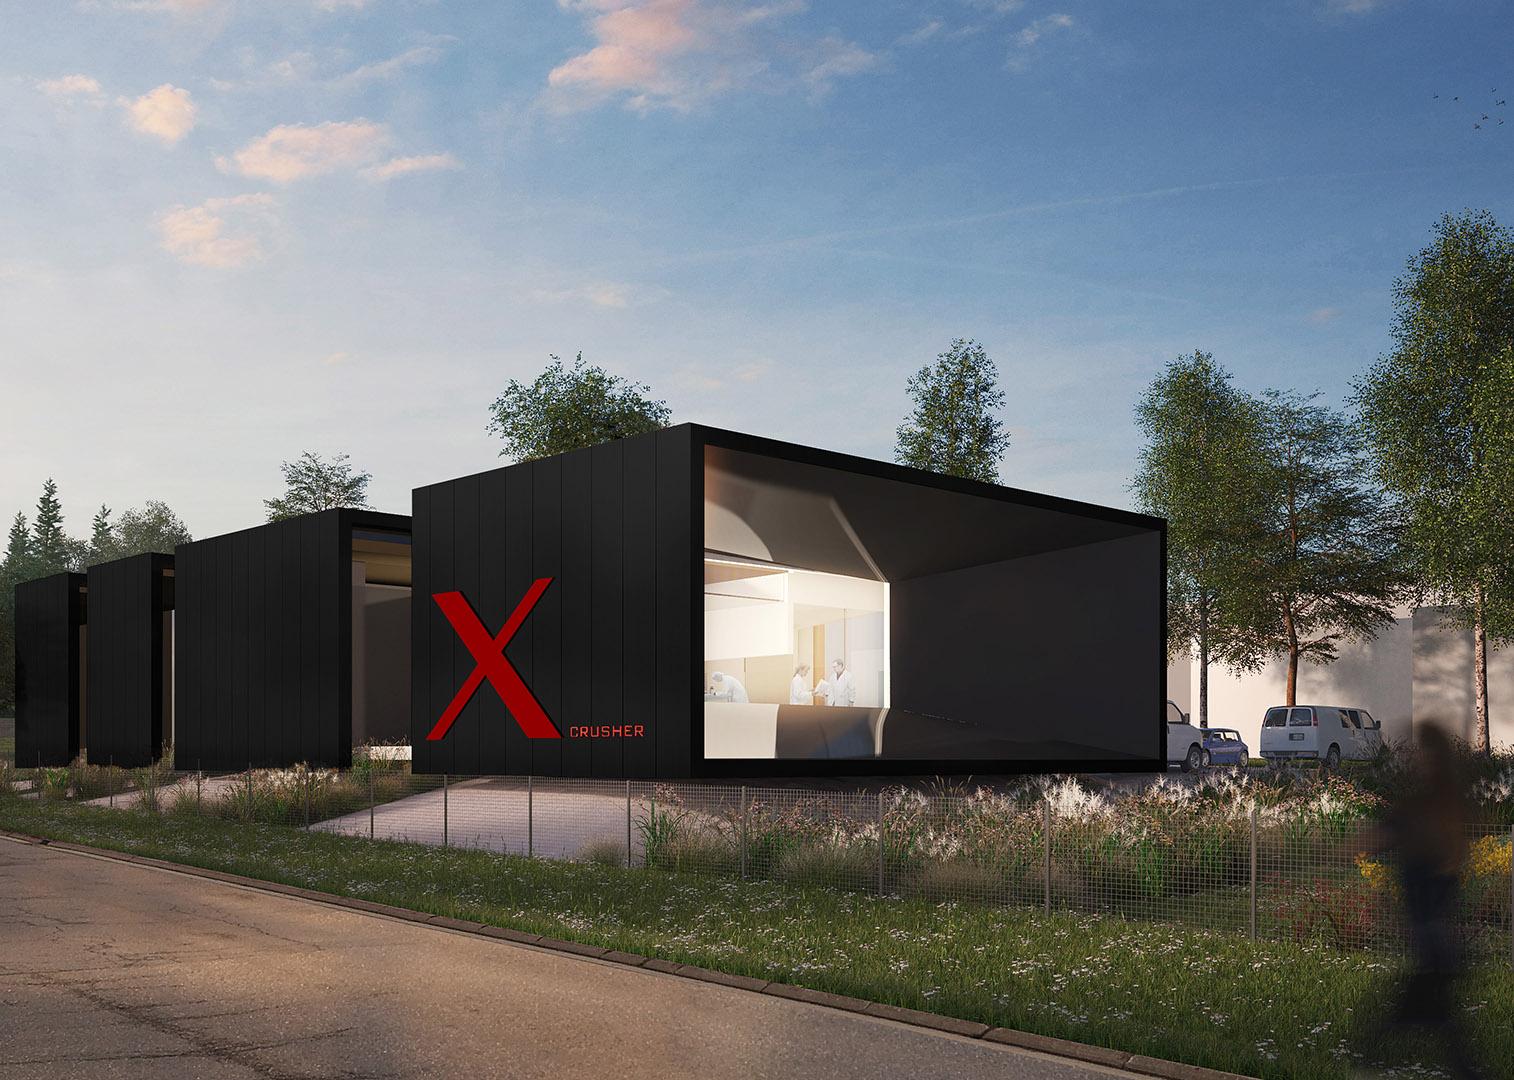 bureaux-laboratoire-xcrusher-val-de-reuil-cba-rouen-2